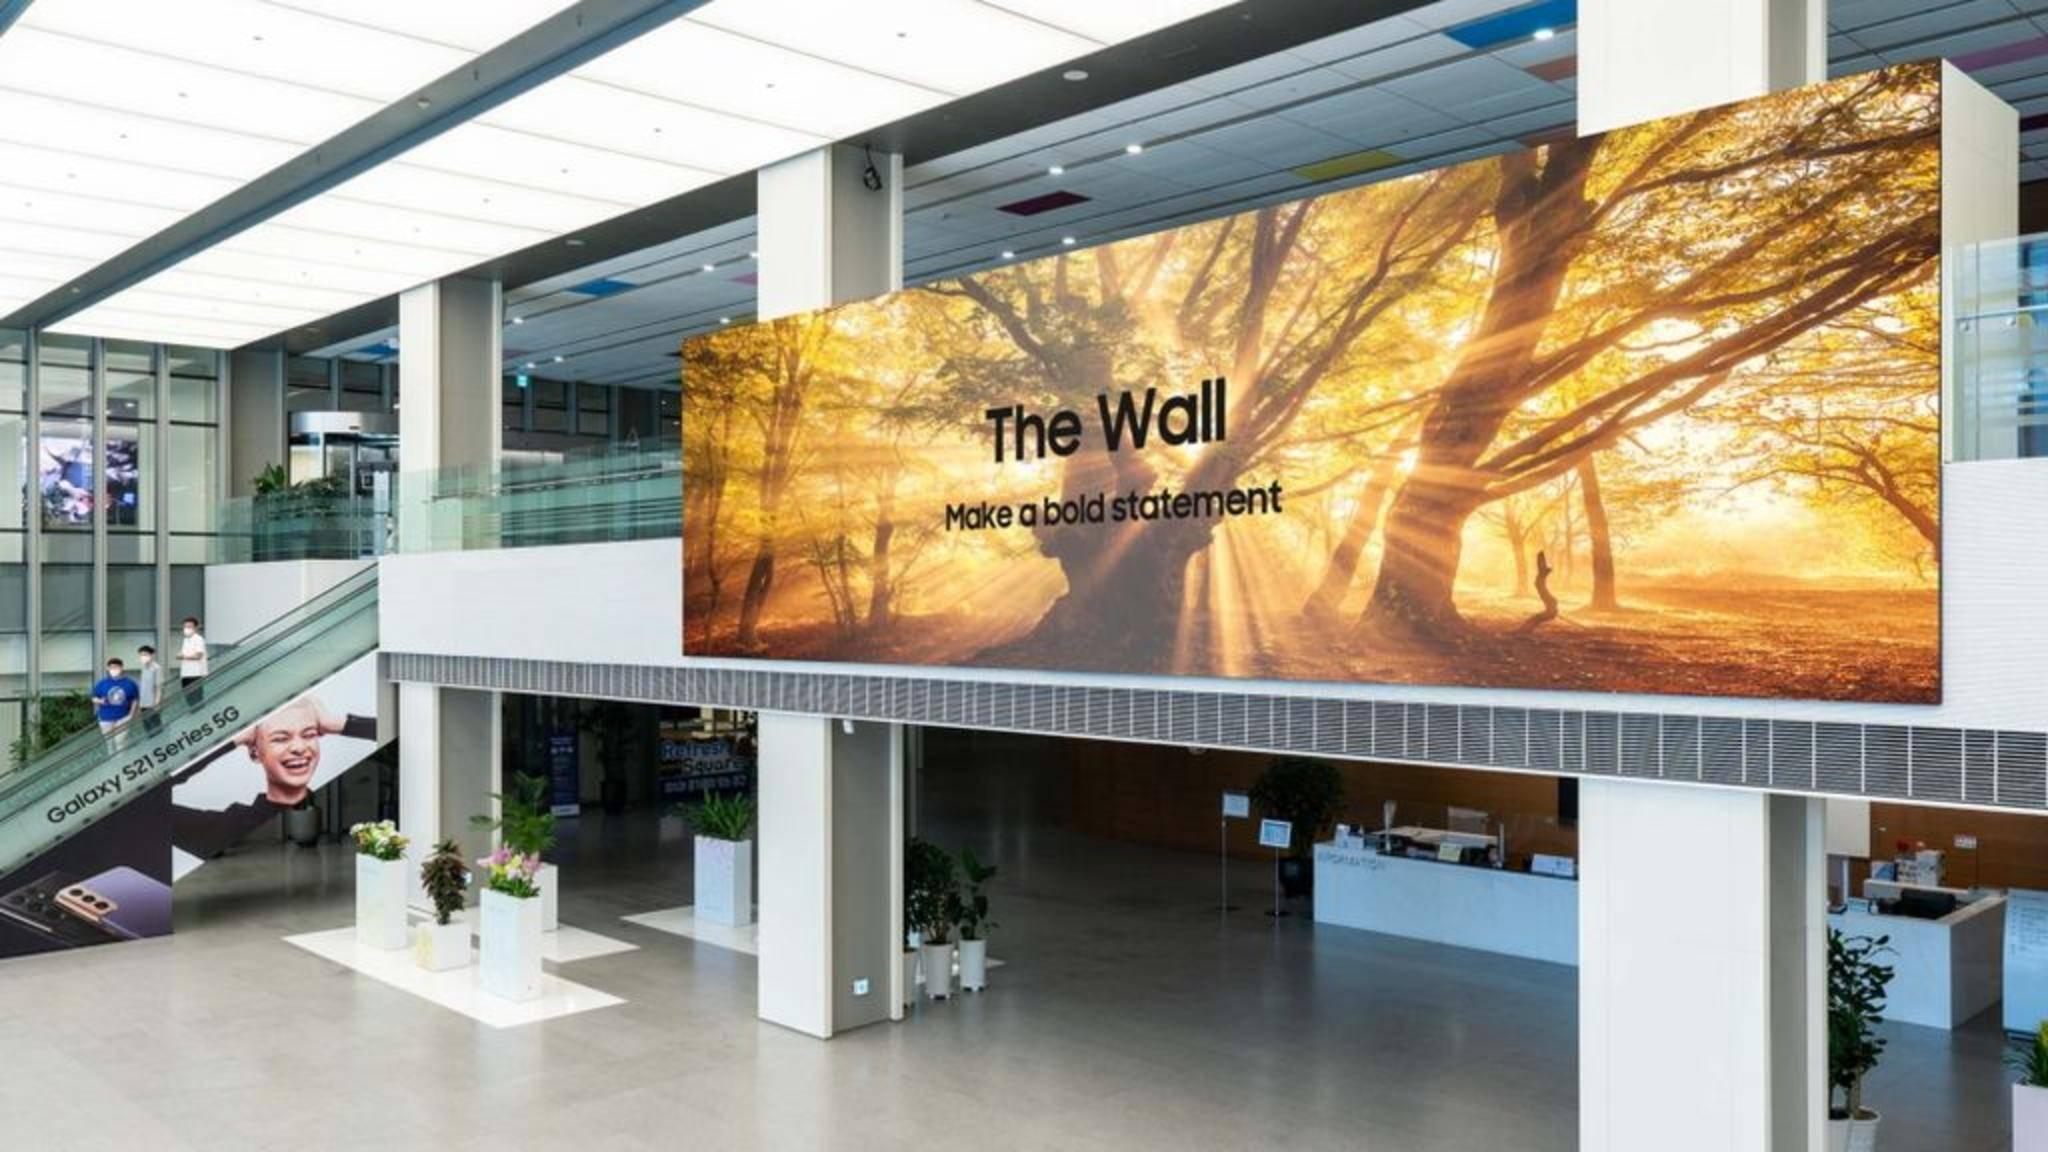 Samsung The Wall 2021 TV